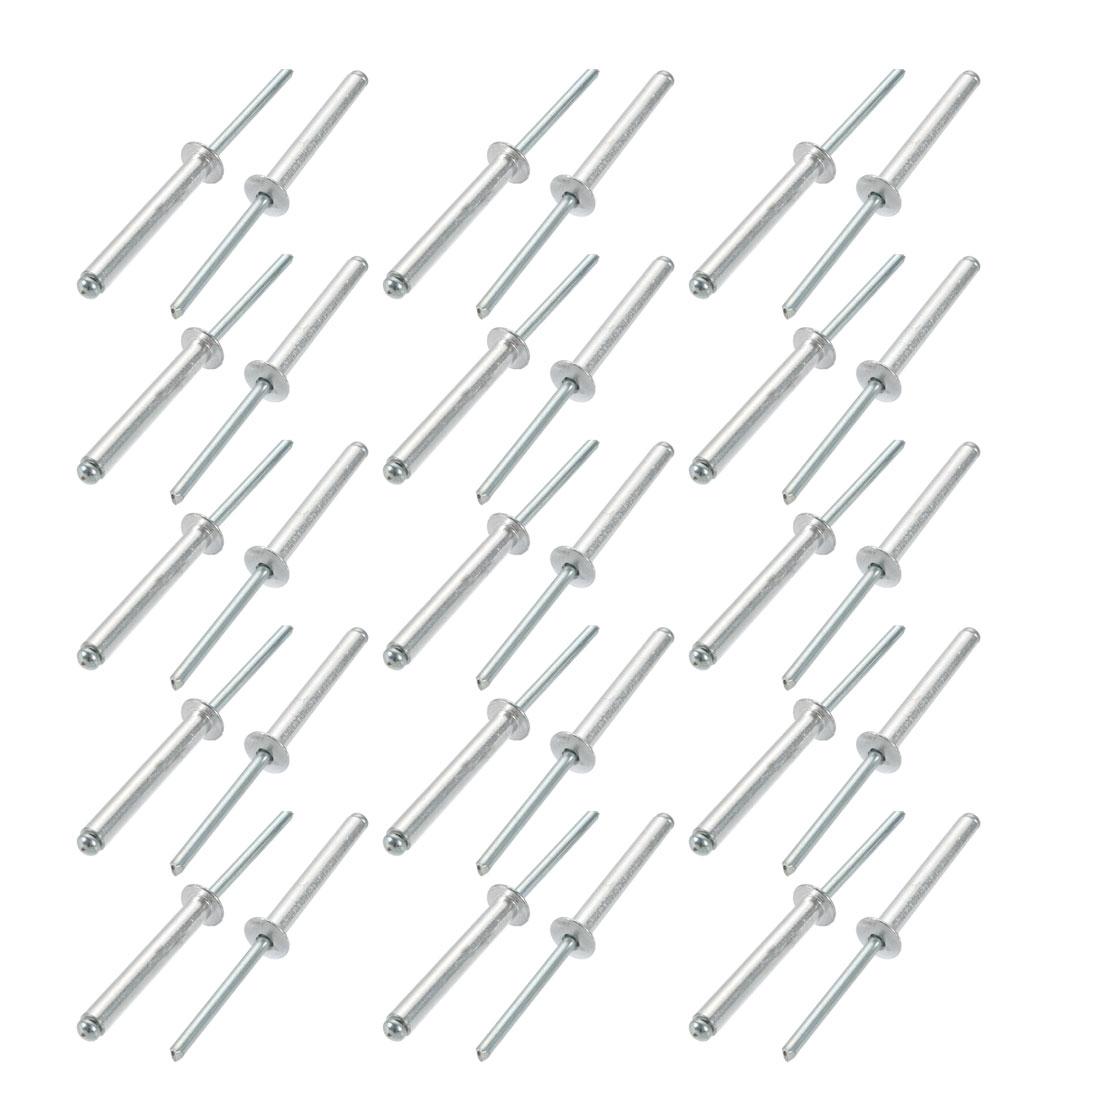 30 Pcs 5mm x 35mm Aluminum/Steel Open End Blind Rivets